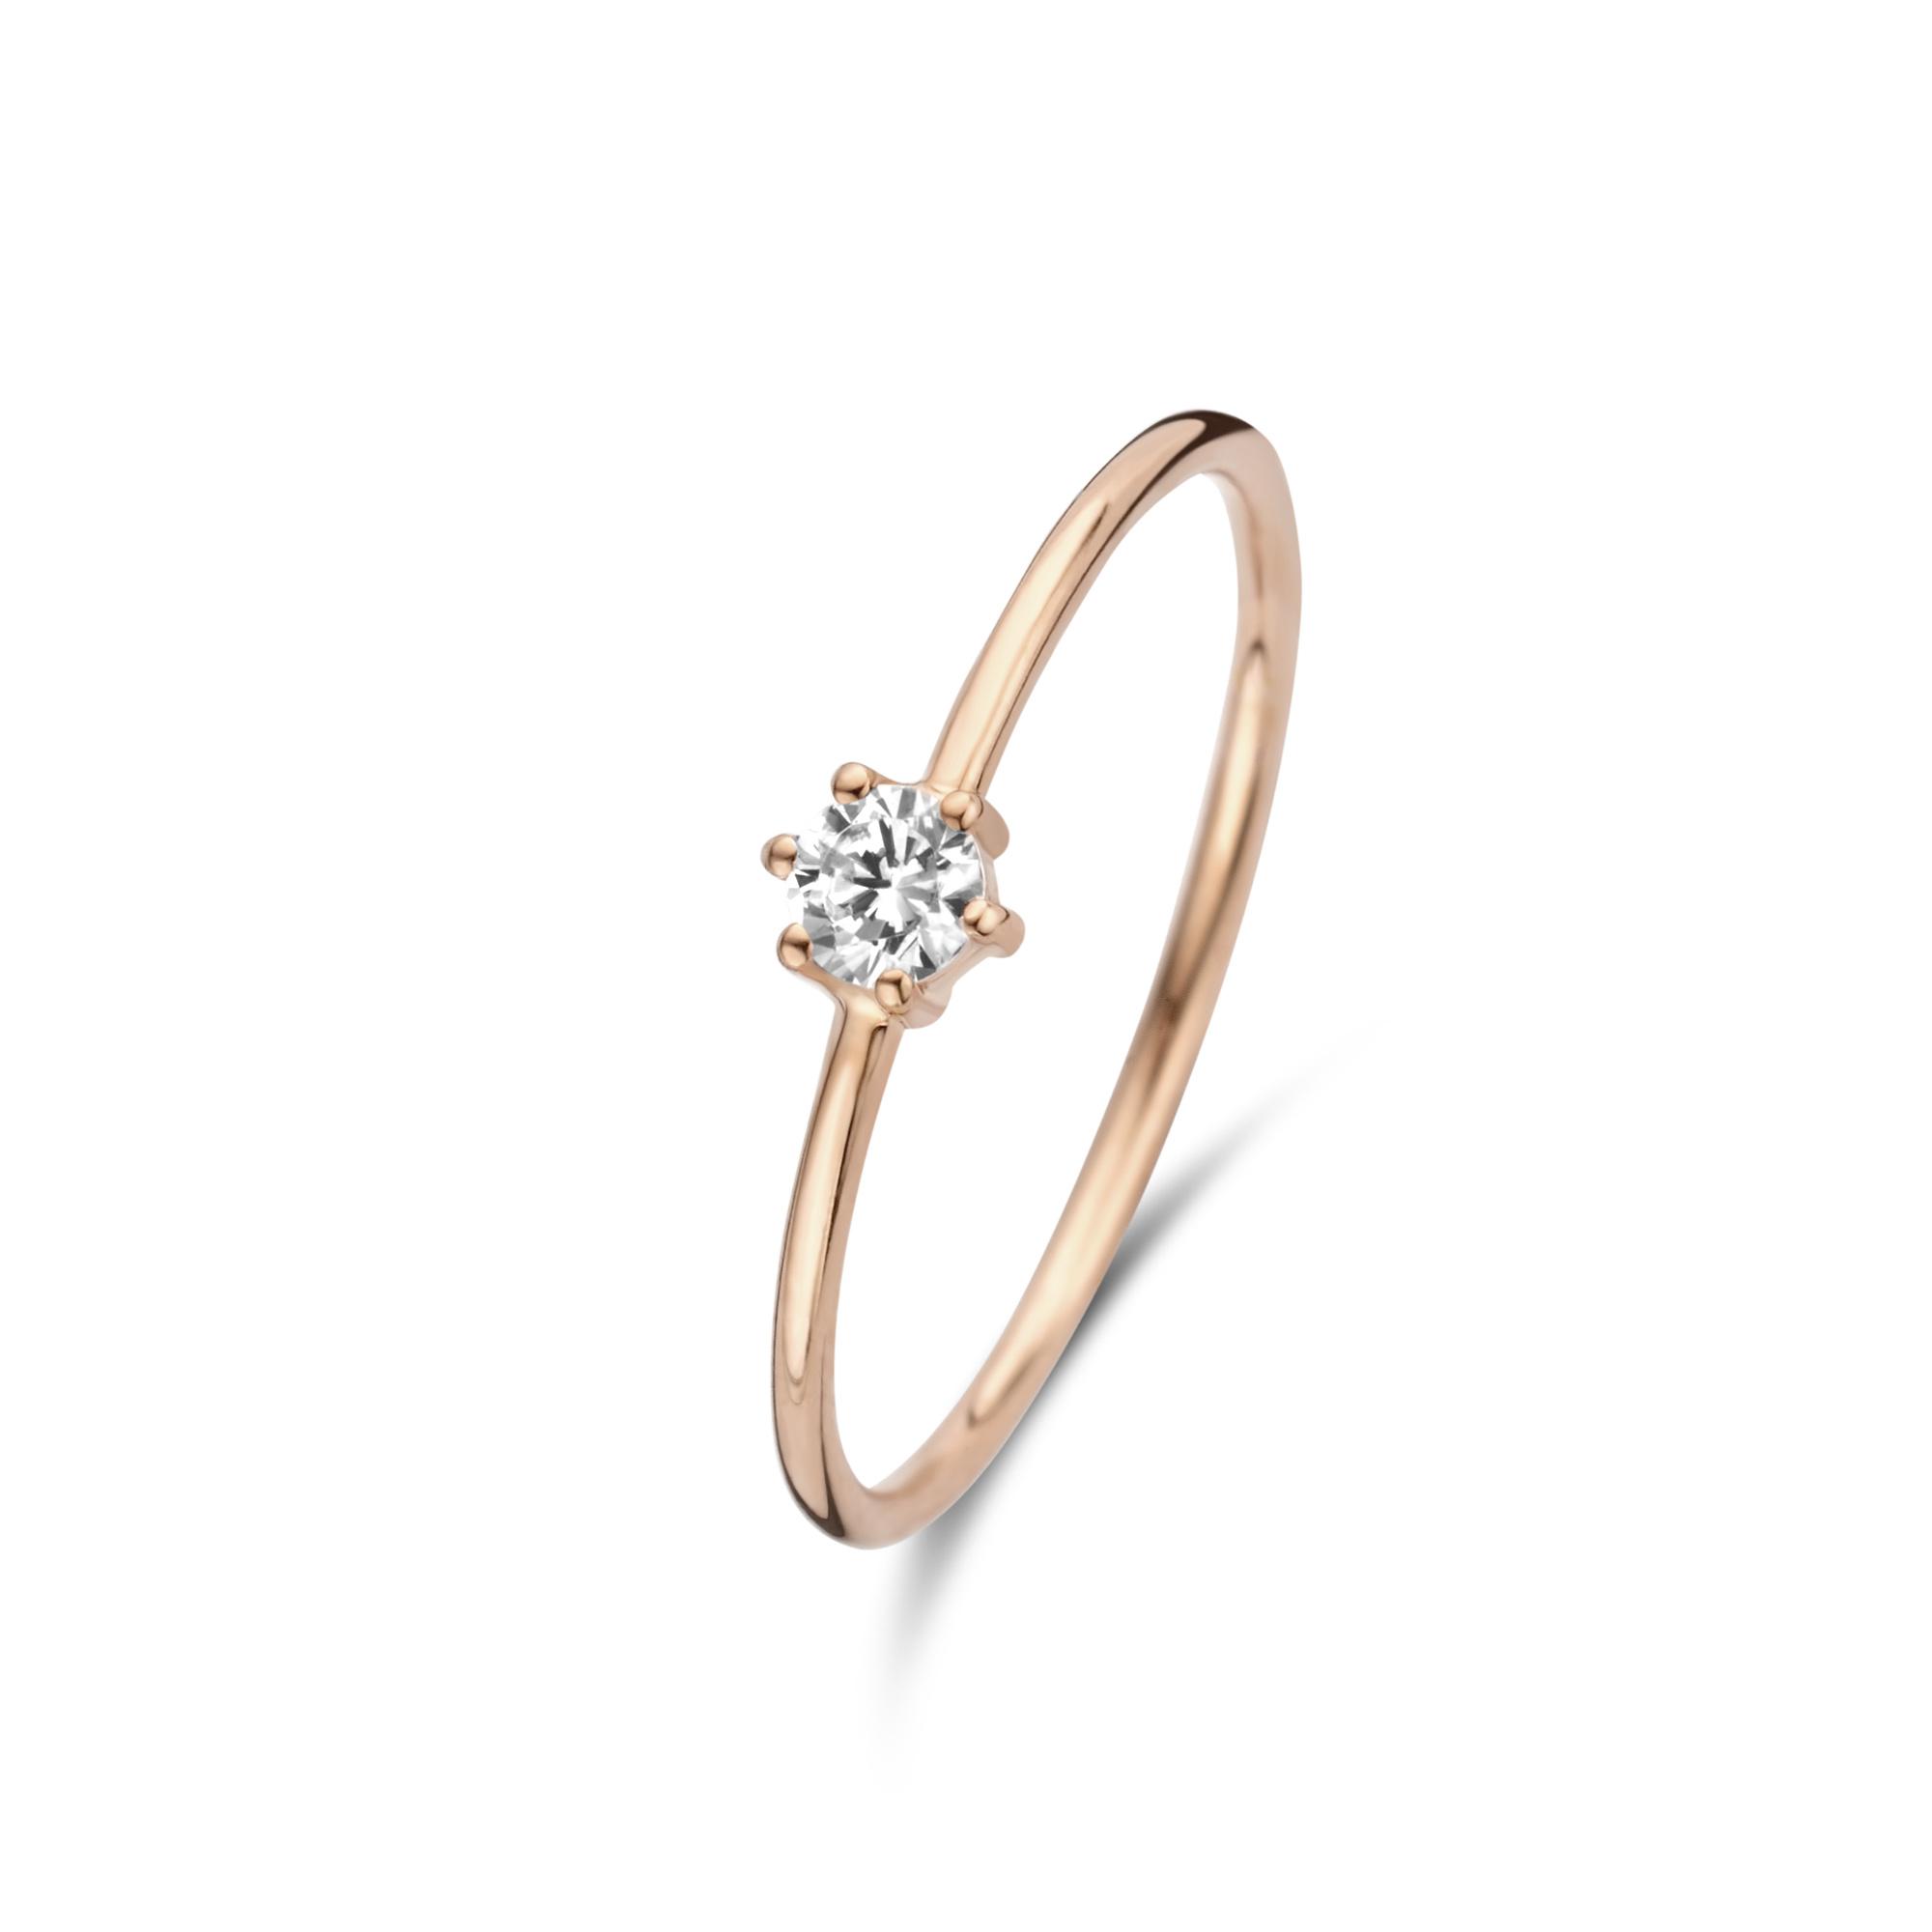 Isabel Bernard La Concorde Abelle 14 karat rose gold ring with zirconia